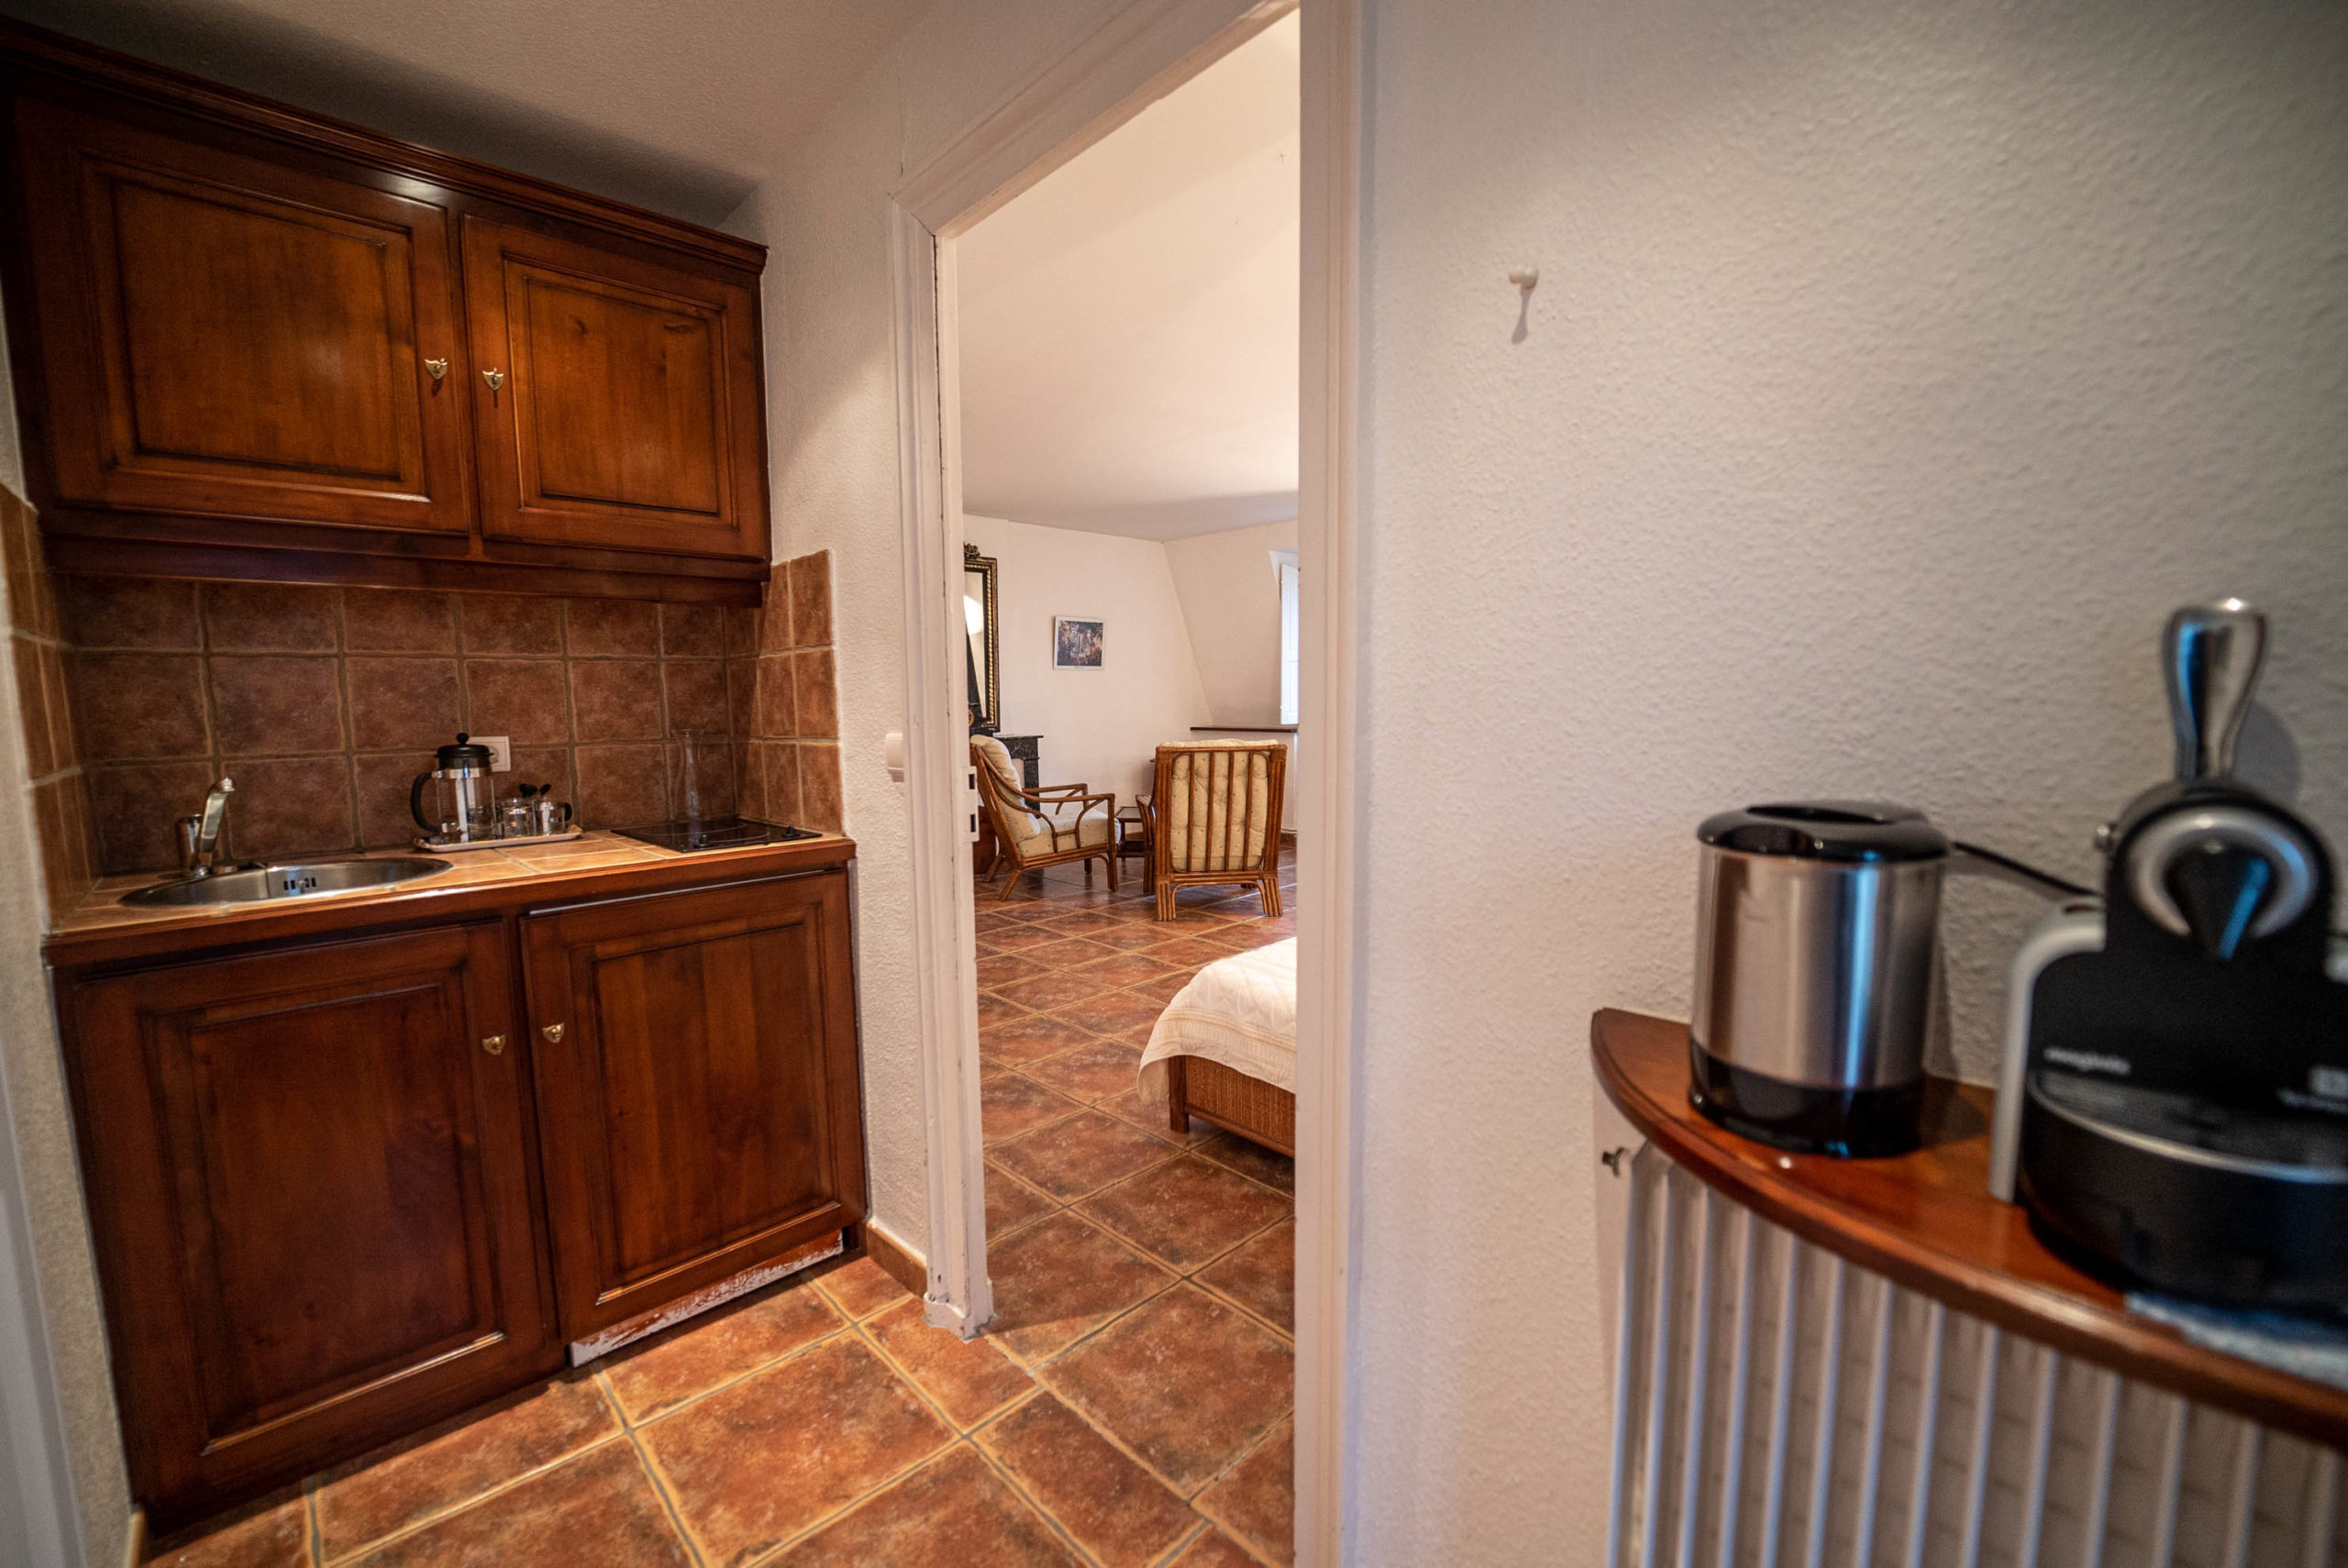 Cuisine Chambre des convives chateau Rauly location bergerac Monbazillac